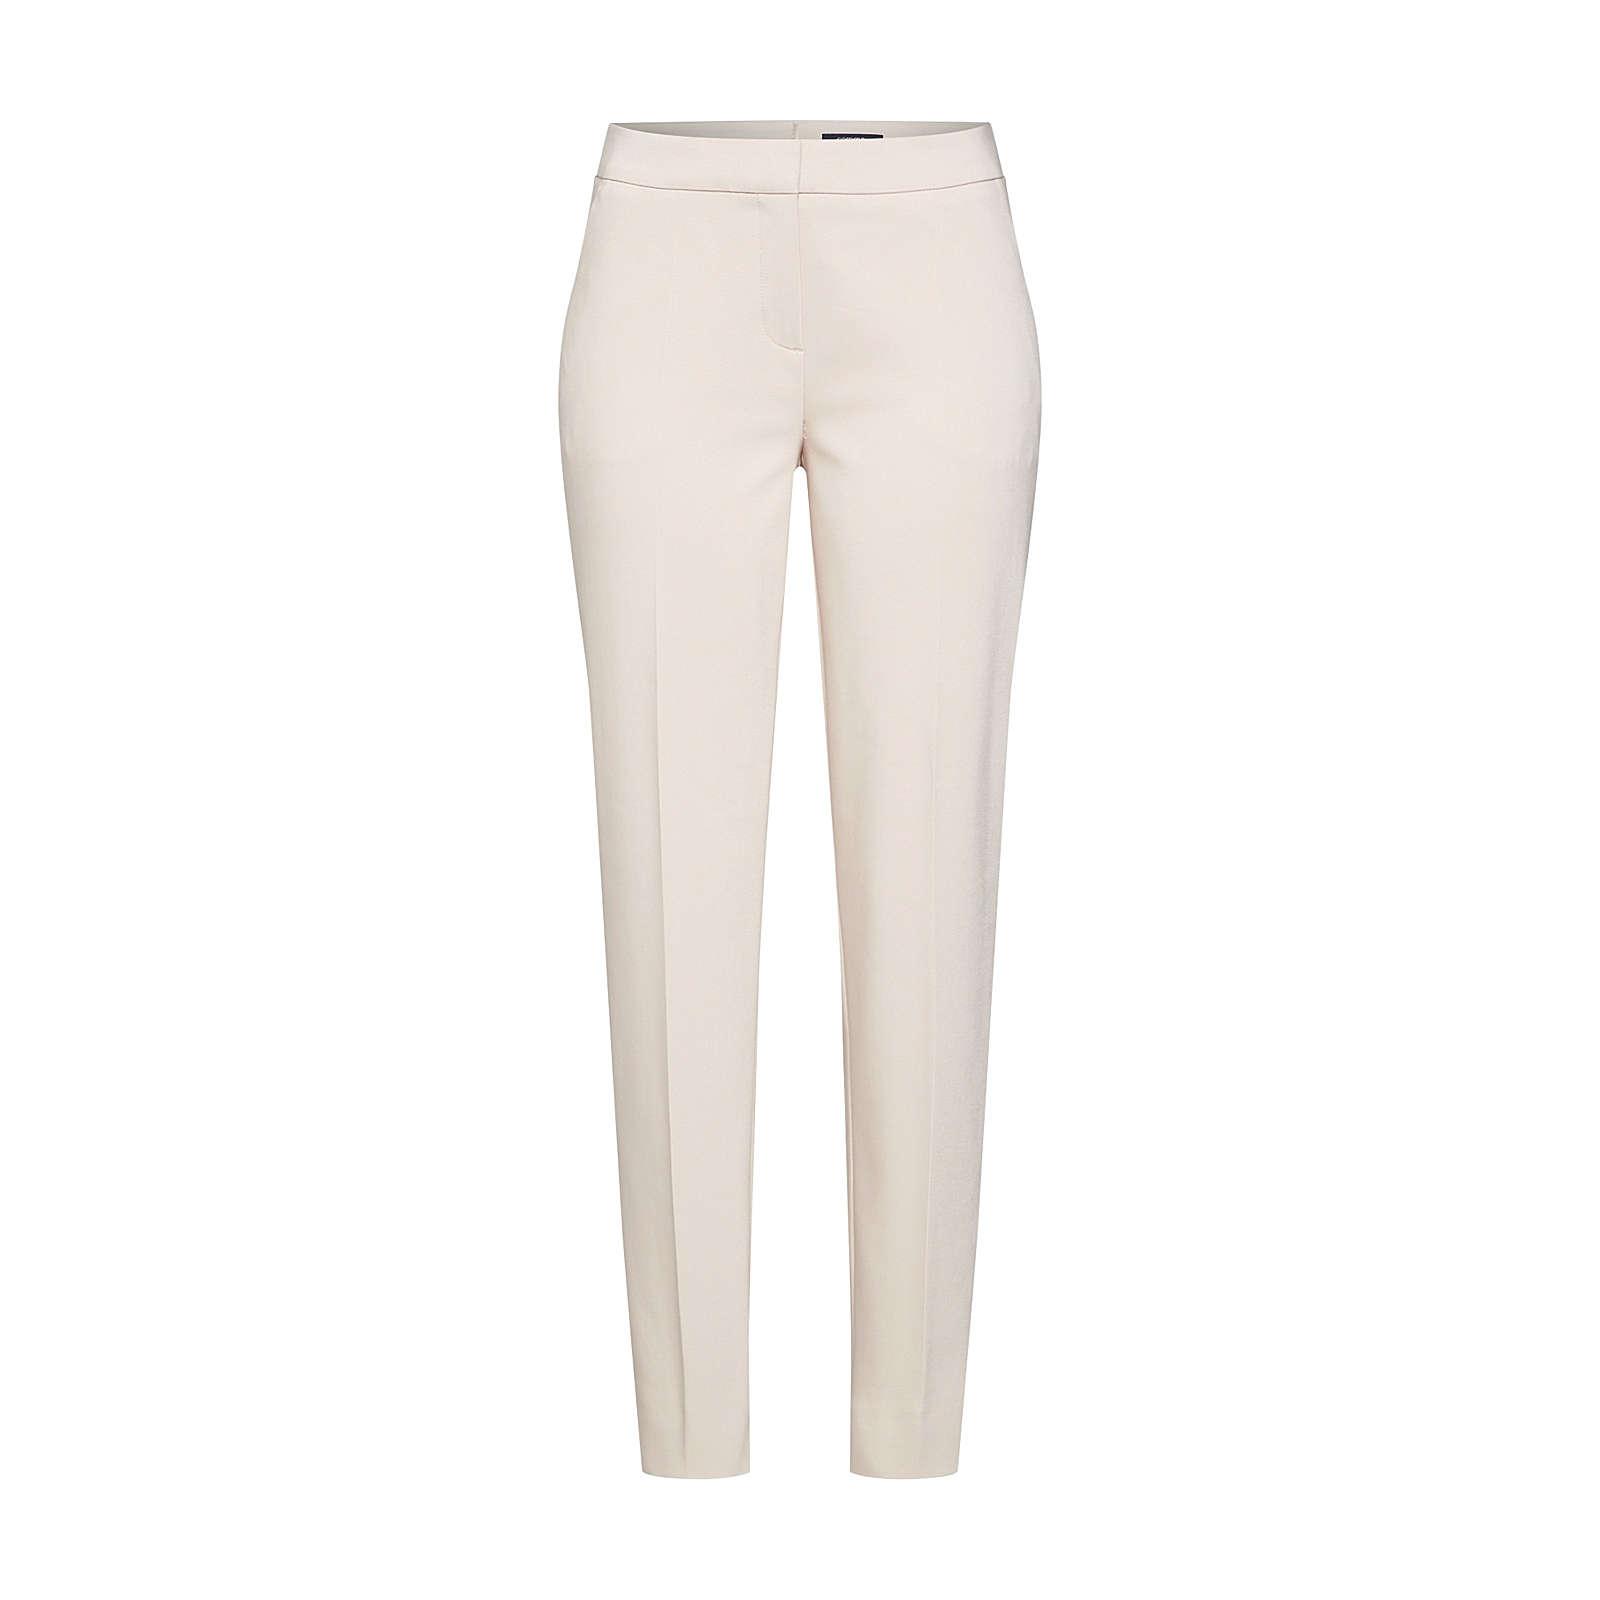 COMMA Bügelfaltenhose Anzughosen beige Damen Gr. 38